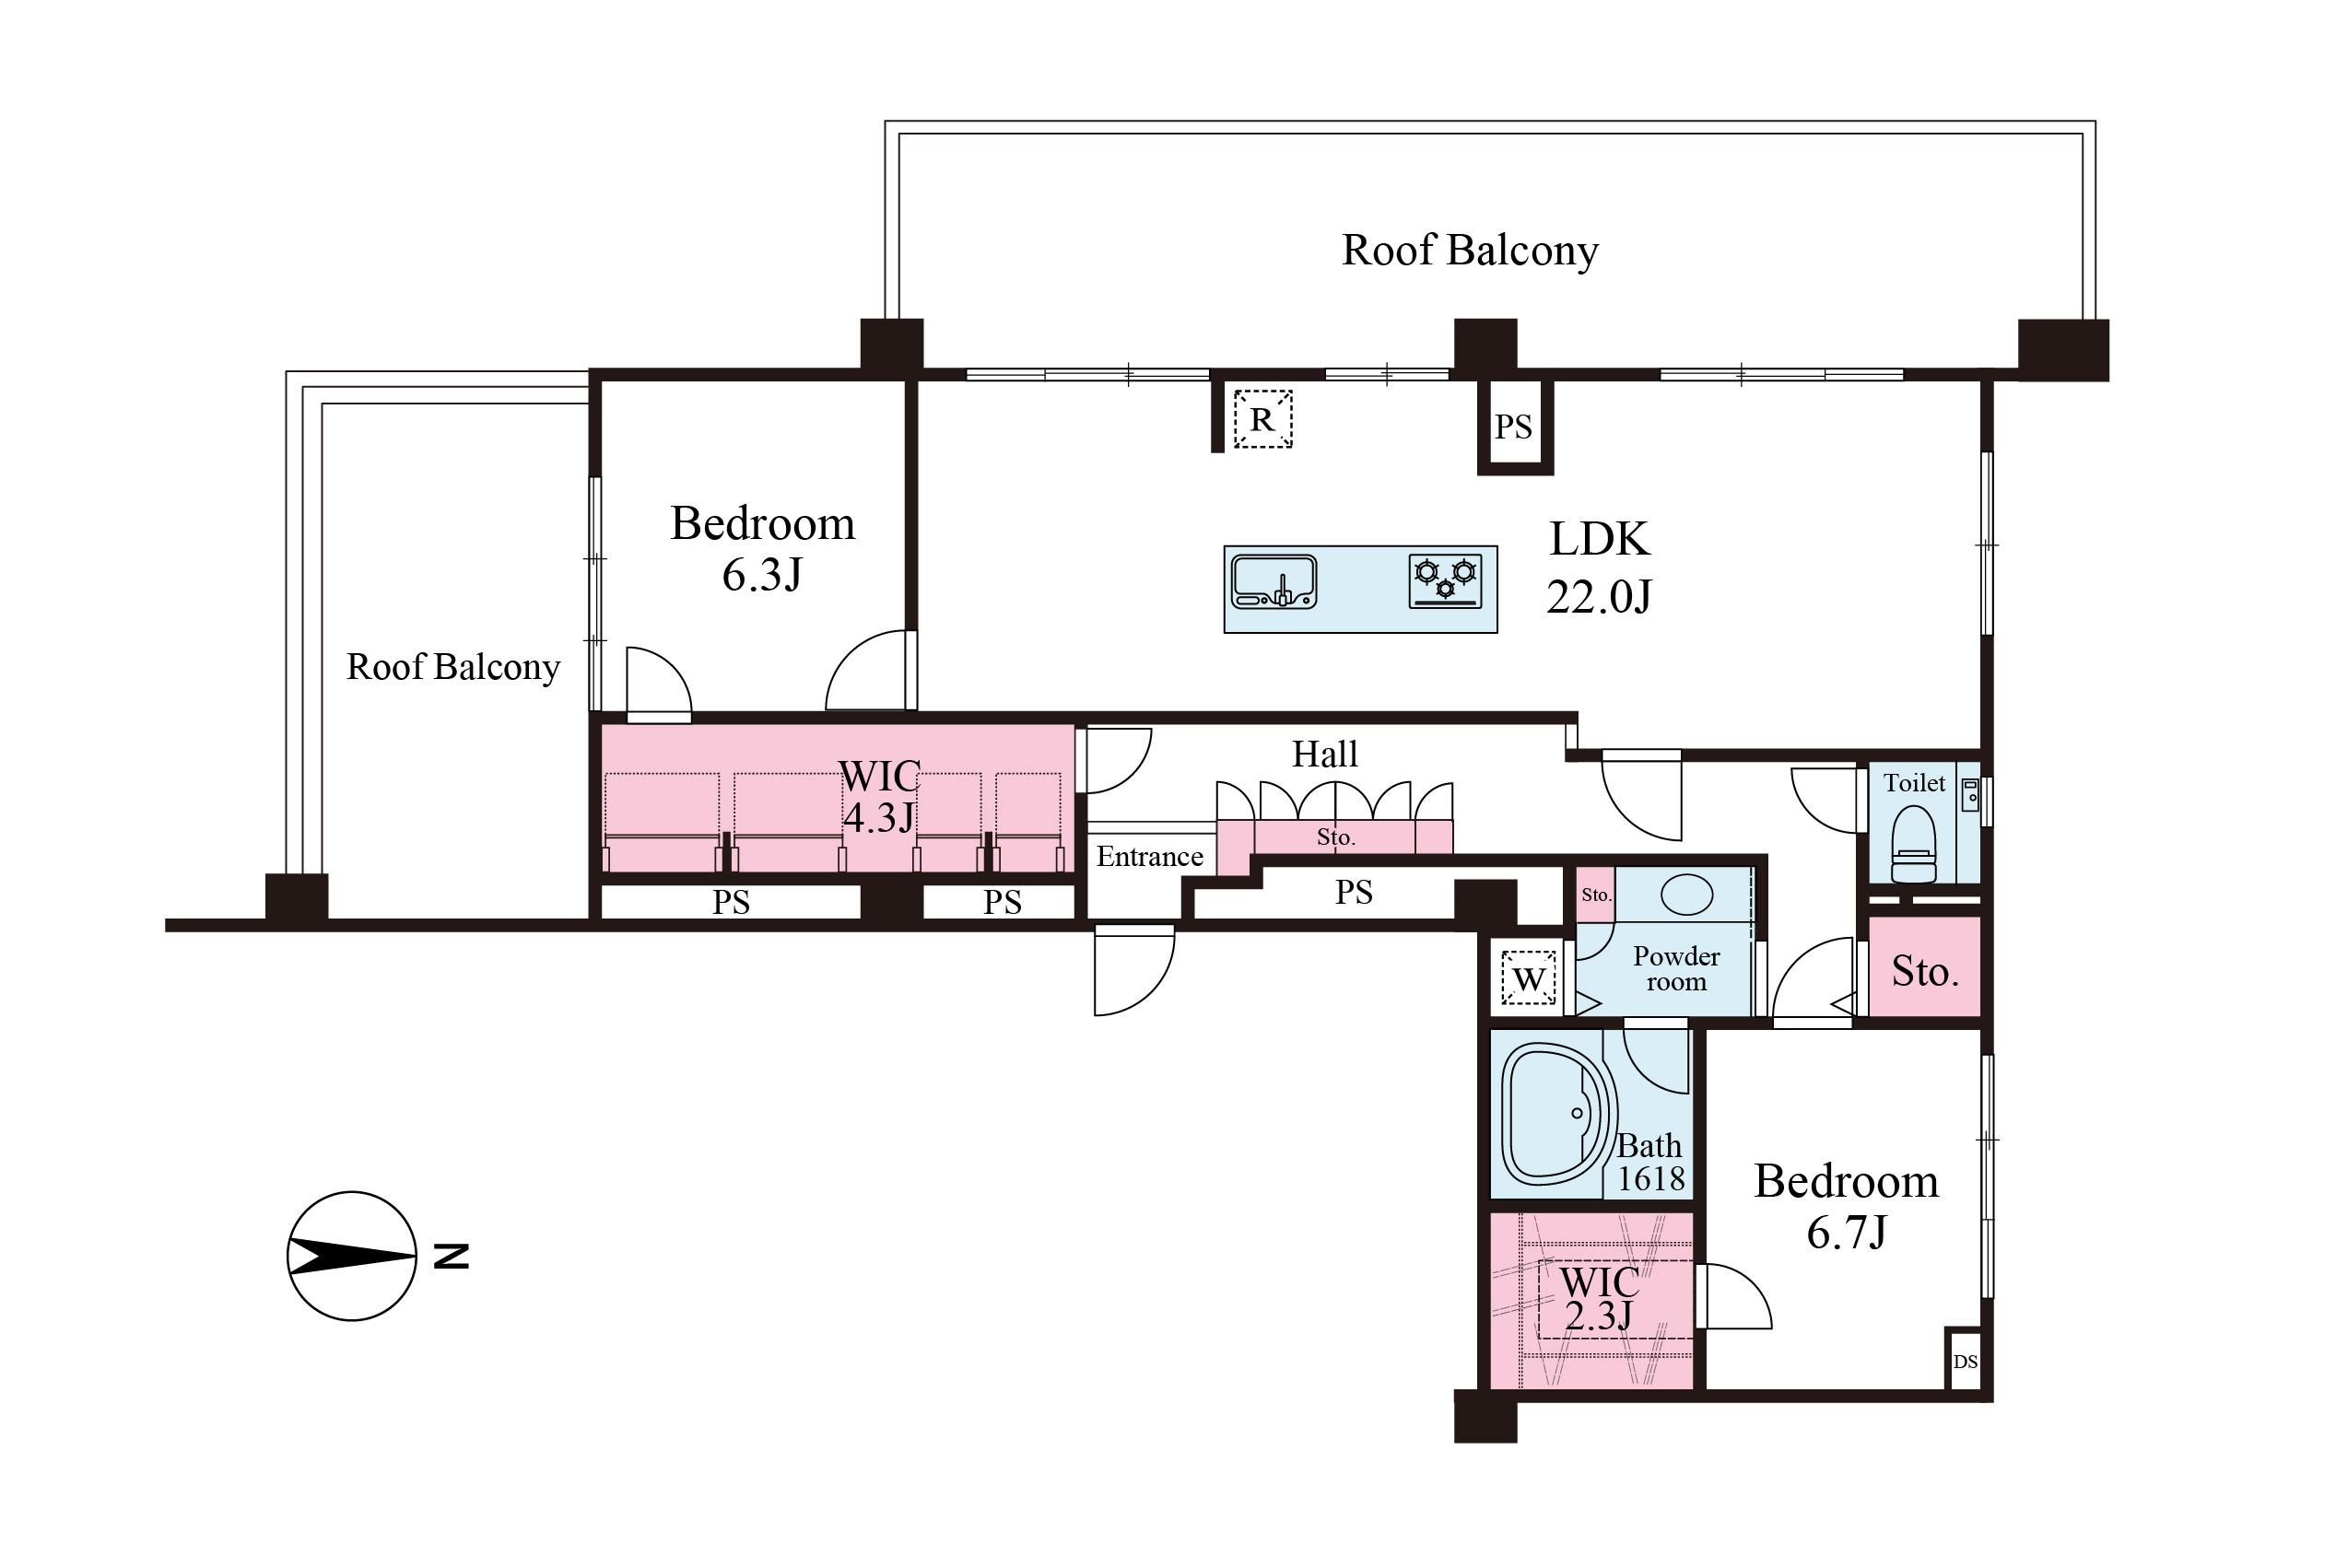 38.49m2の二面ルーフバルコニー、三方角部屋、95.49m2の2LDK+2WIC